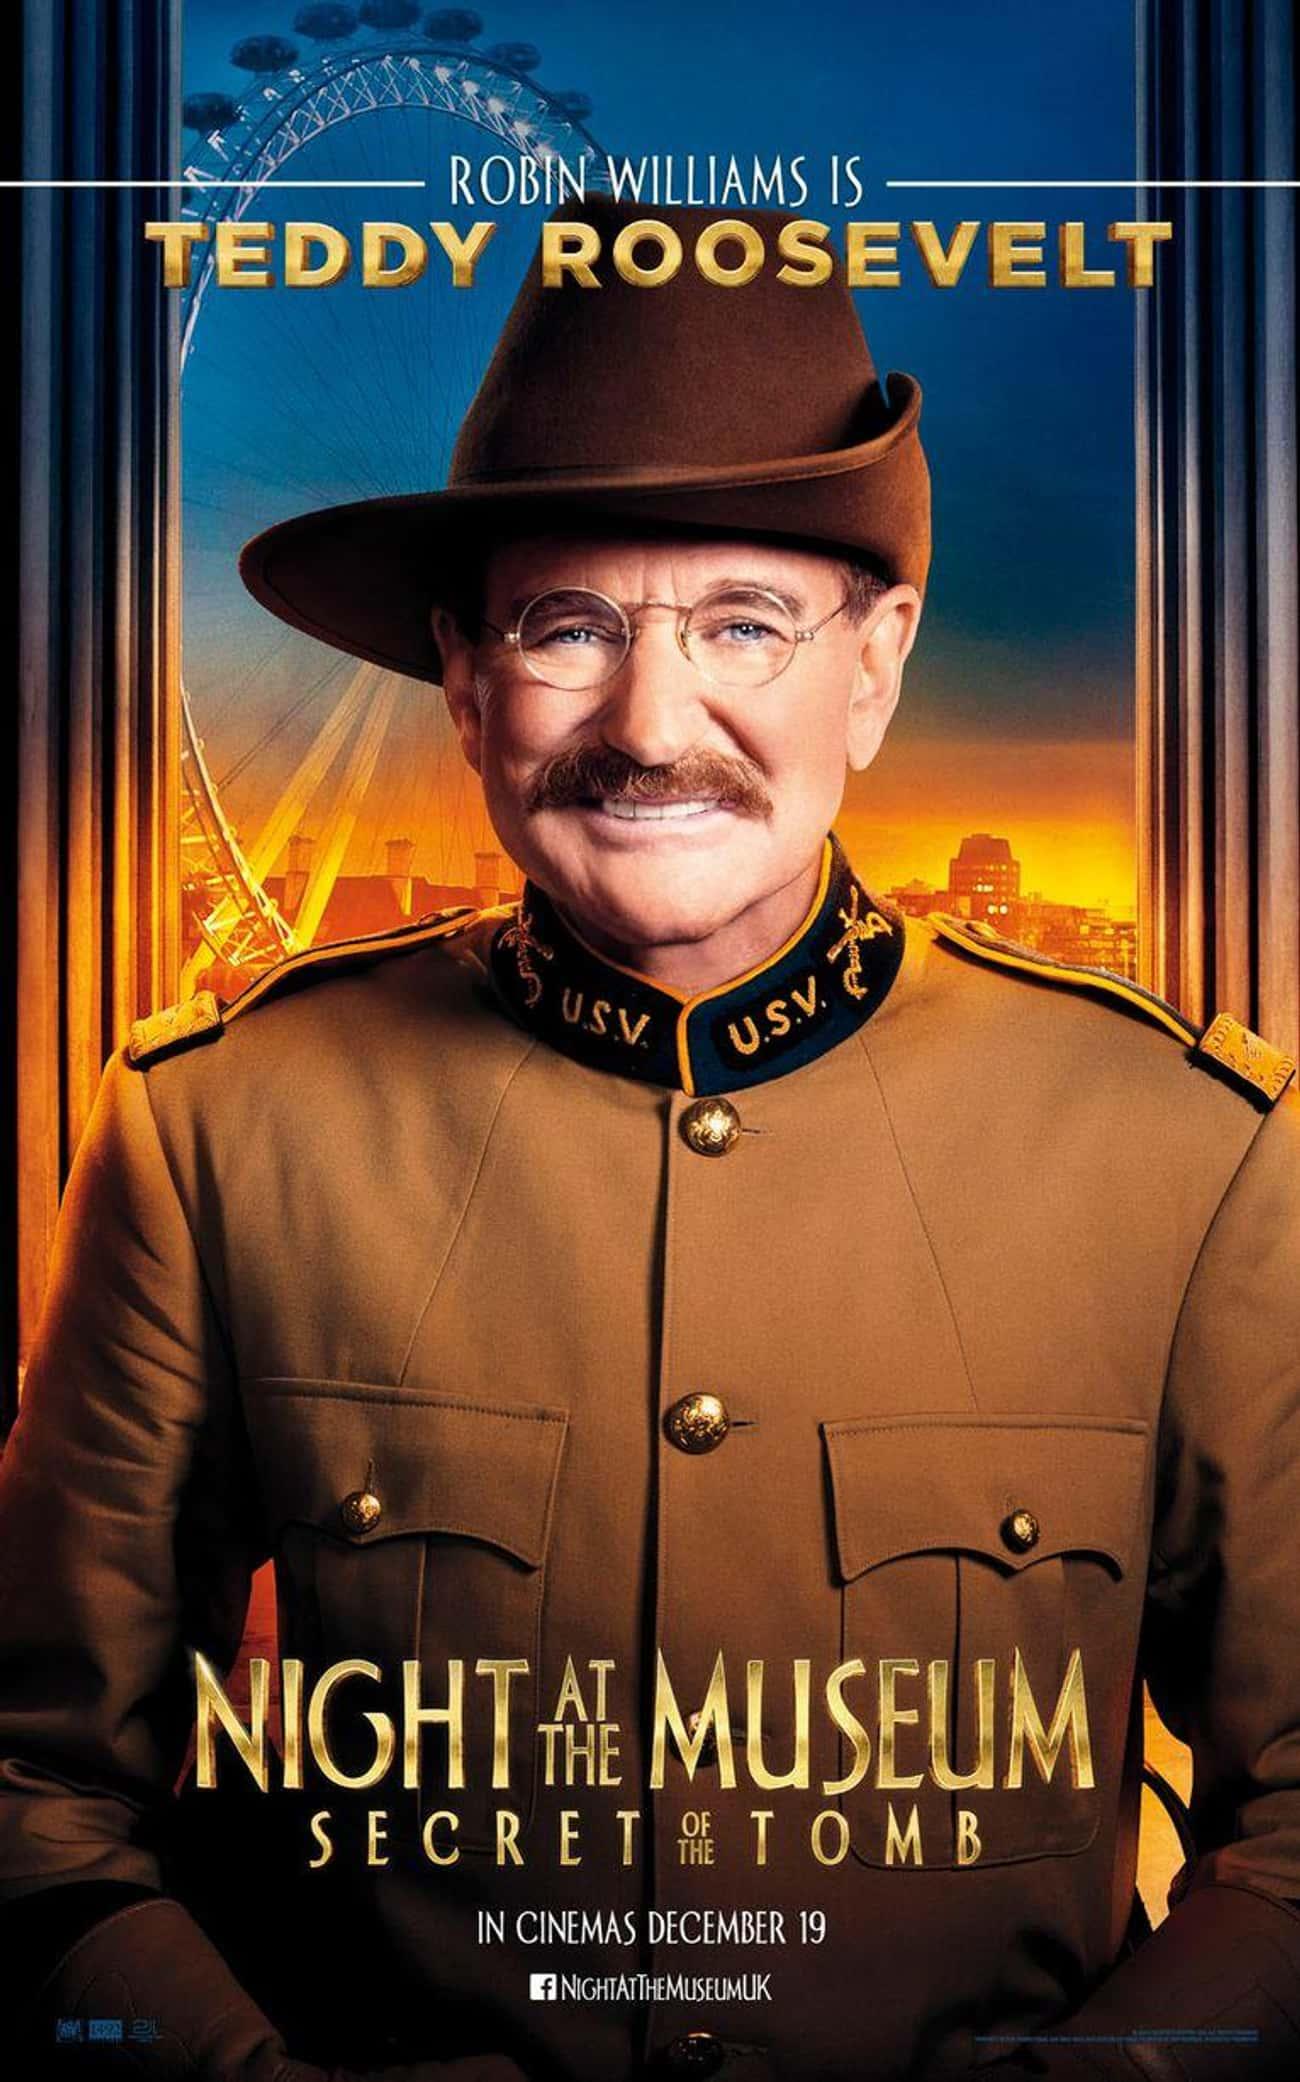 Robin Williams - Teddy Roosevelt